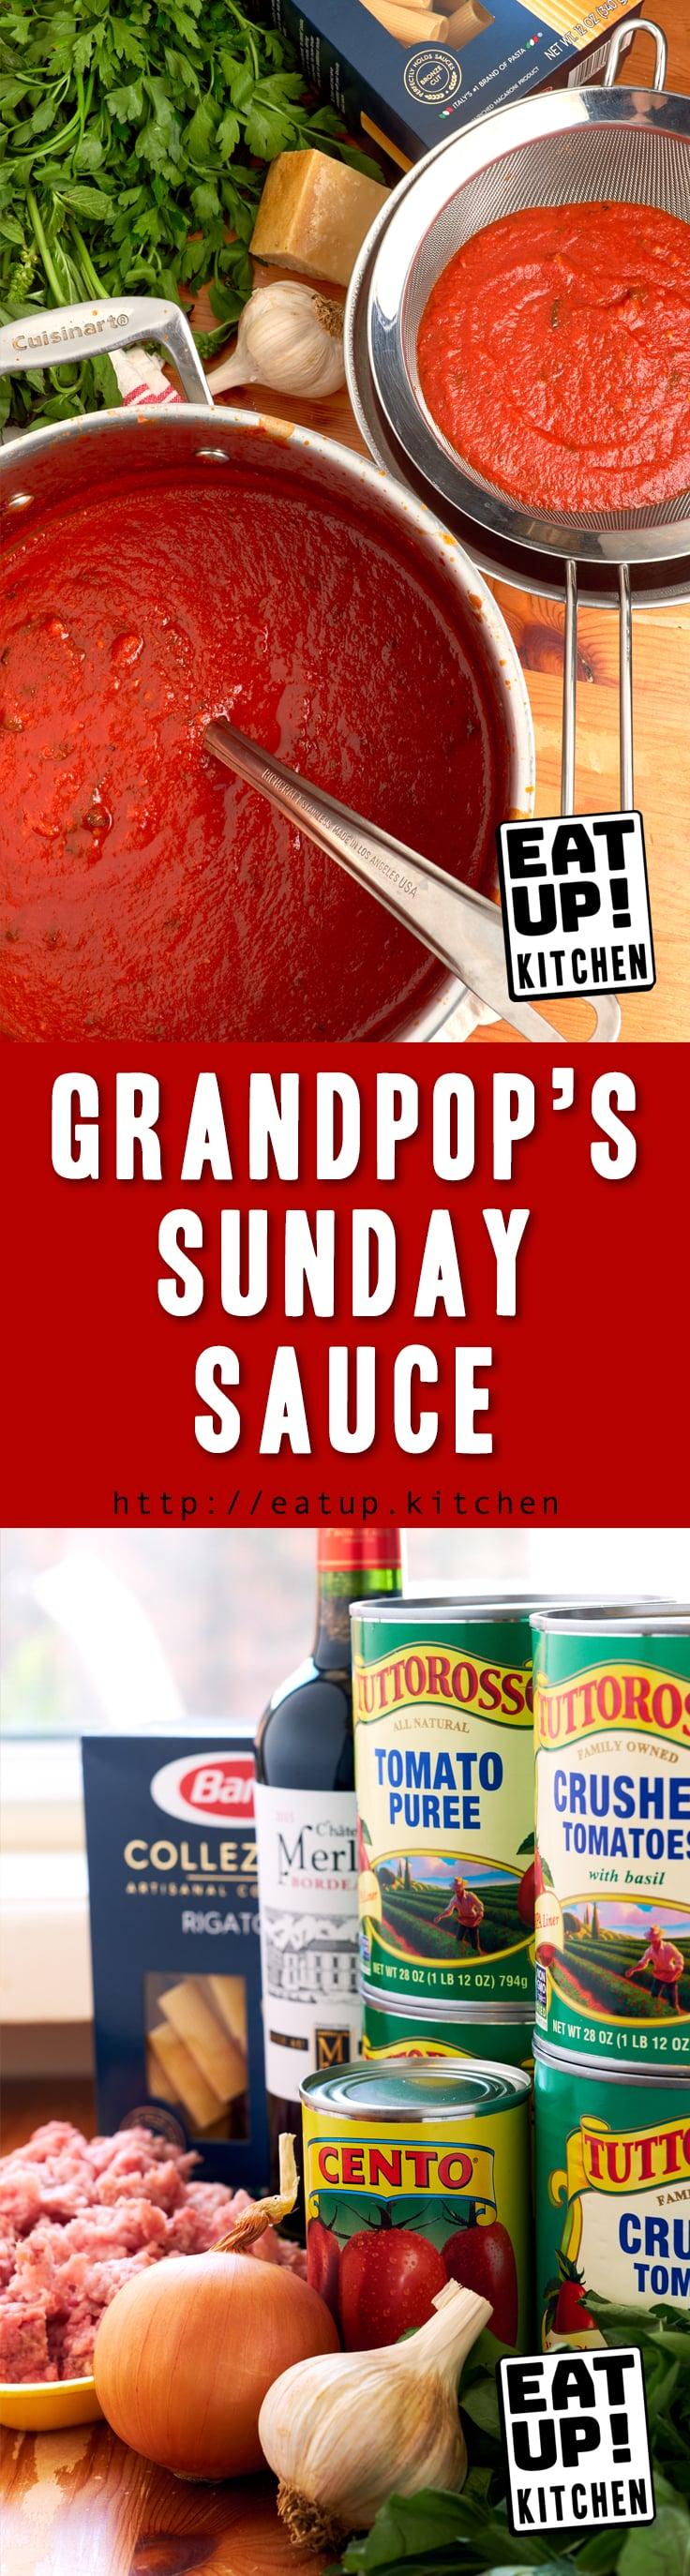 Grandpop's Sunday Sauce